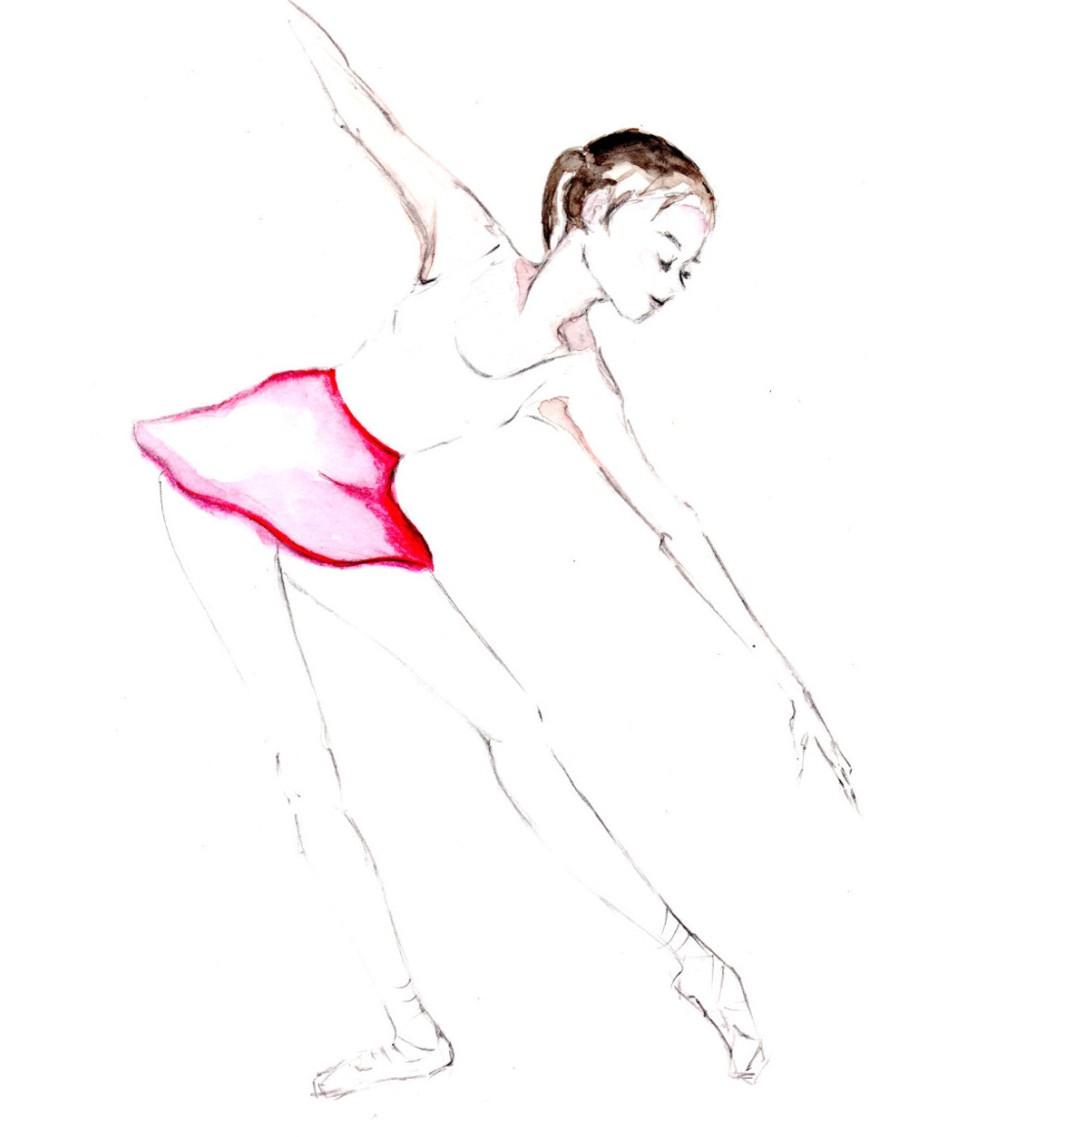 Balletred